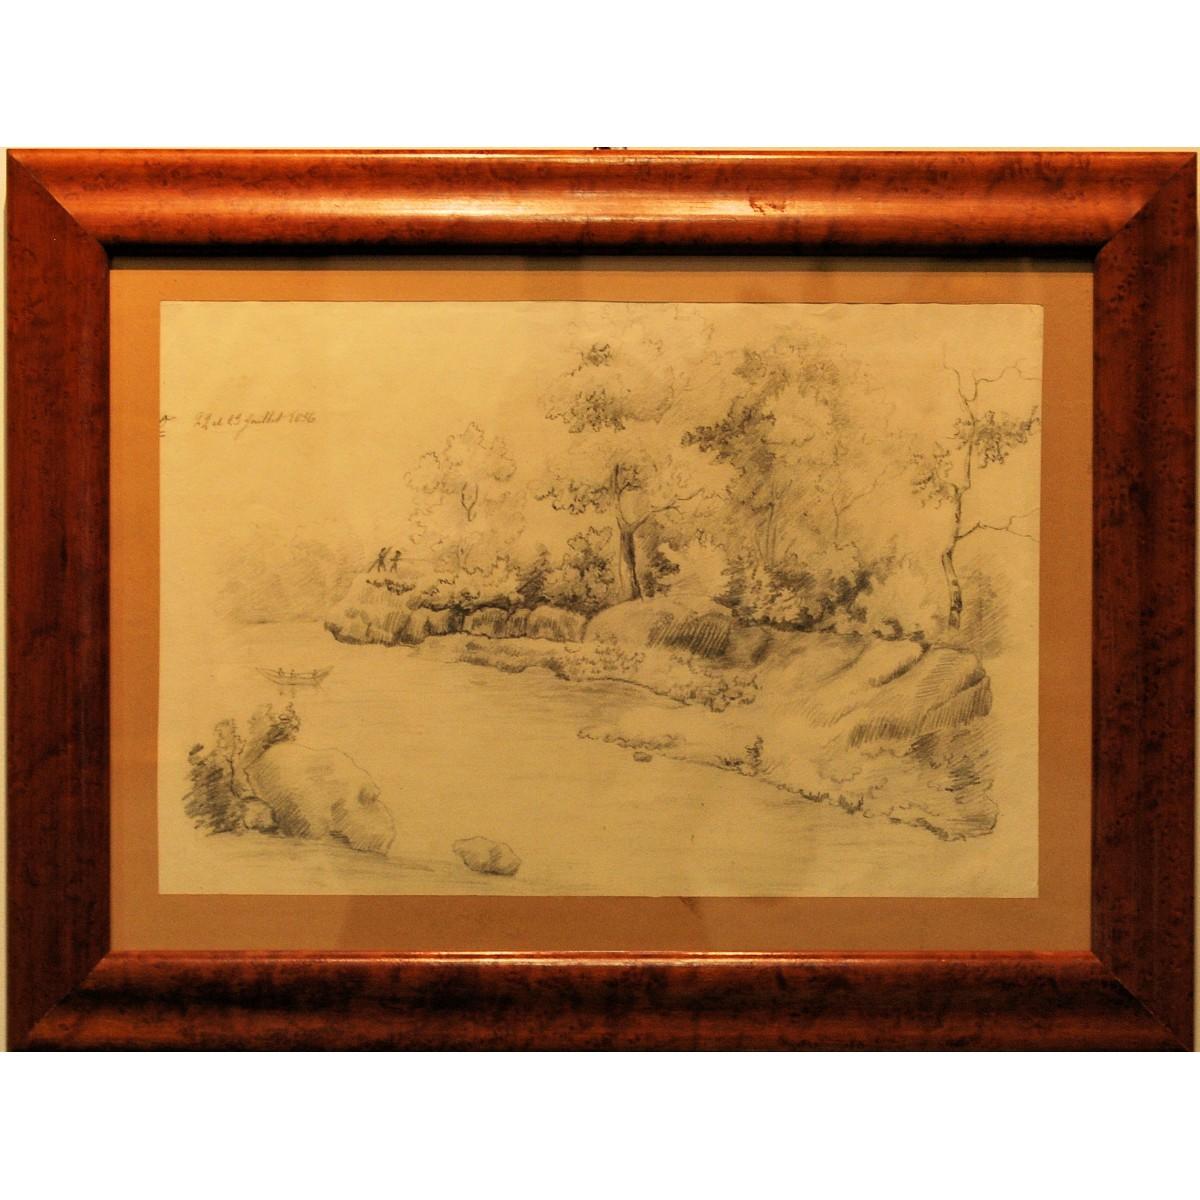 Paisaje, lapis, siglo XIX.